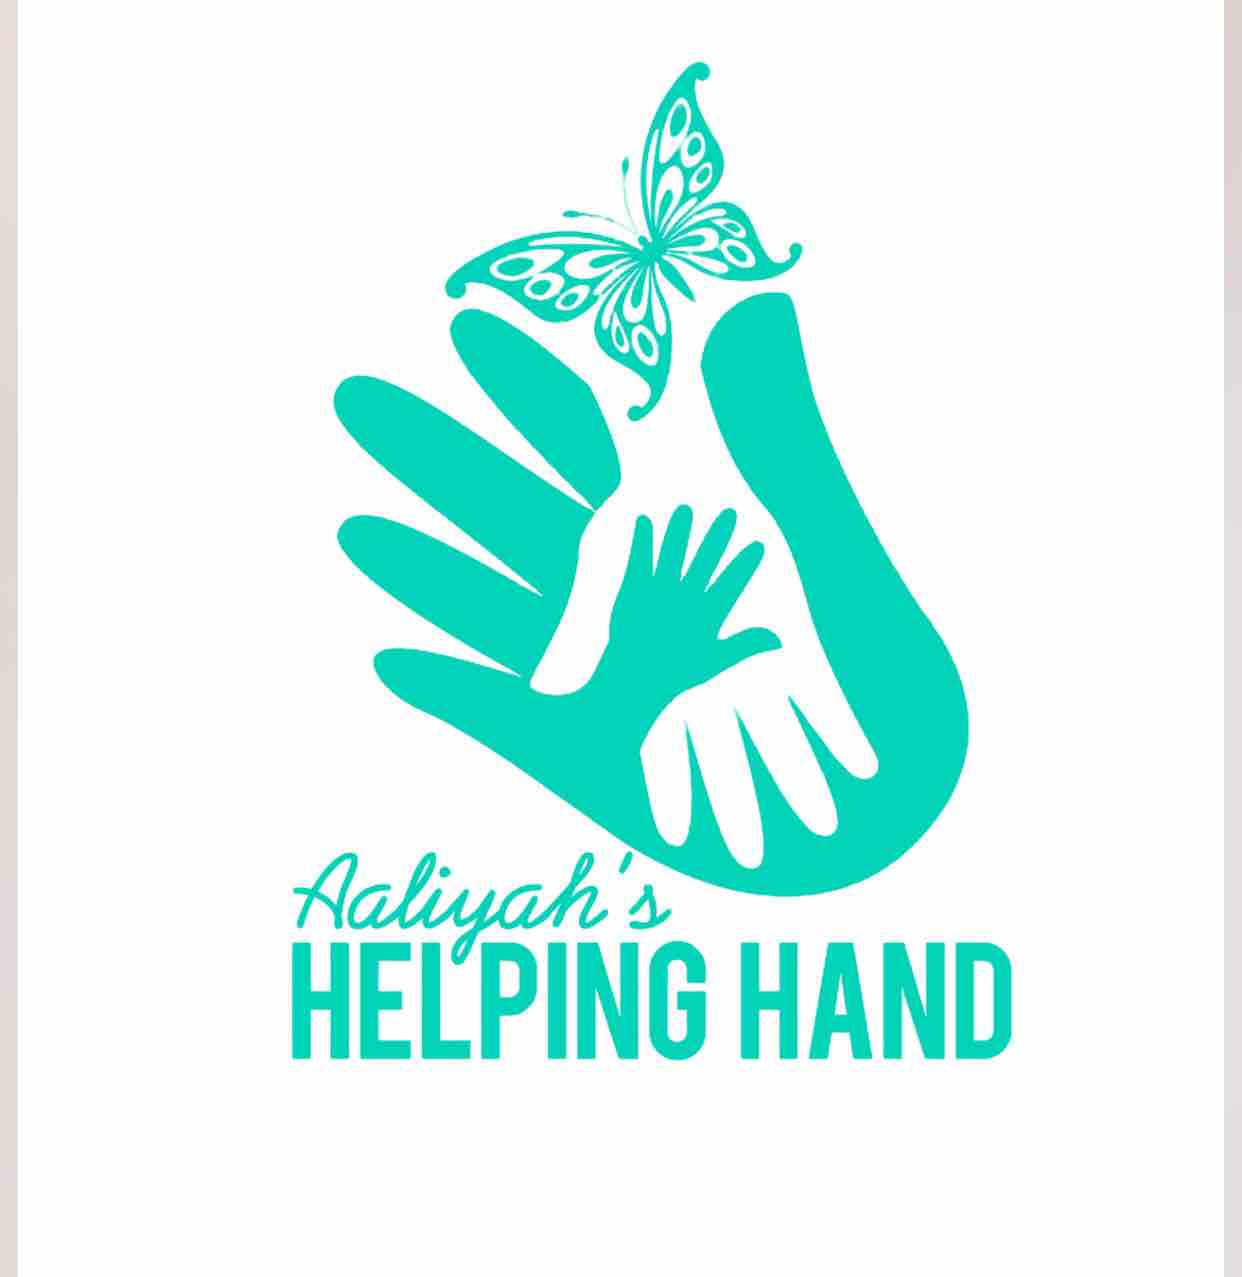 fundraiser by zainab jalloh : aaliyah's helping hand foundation